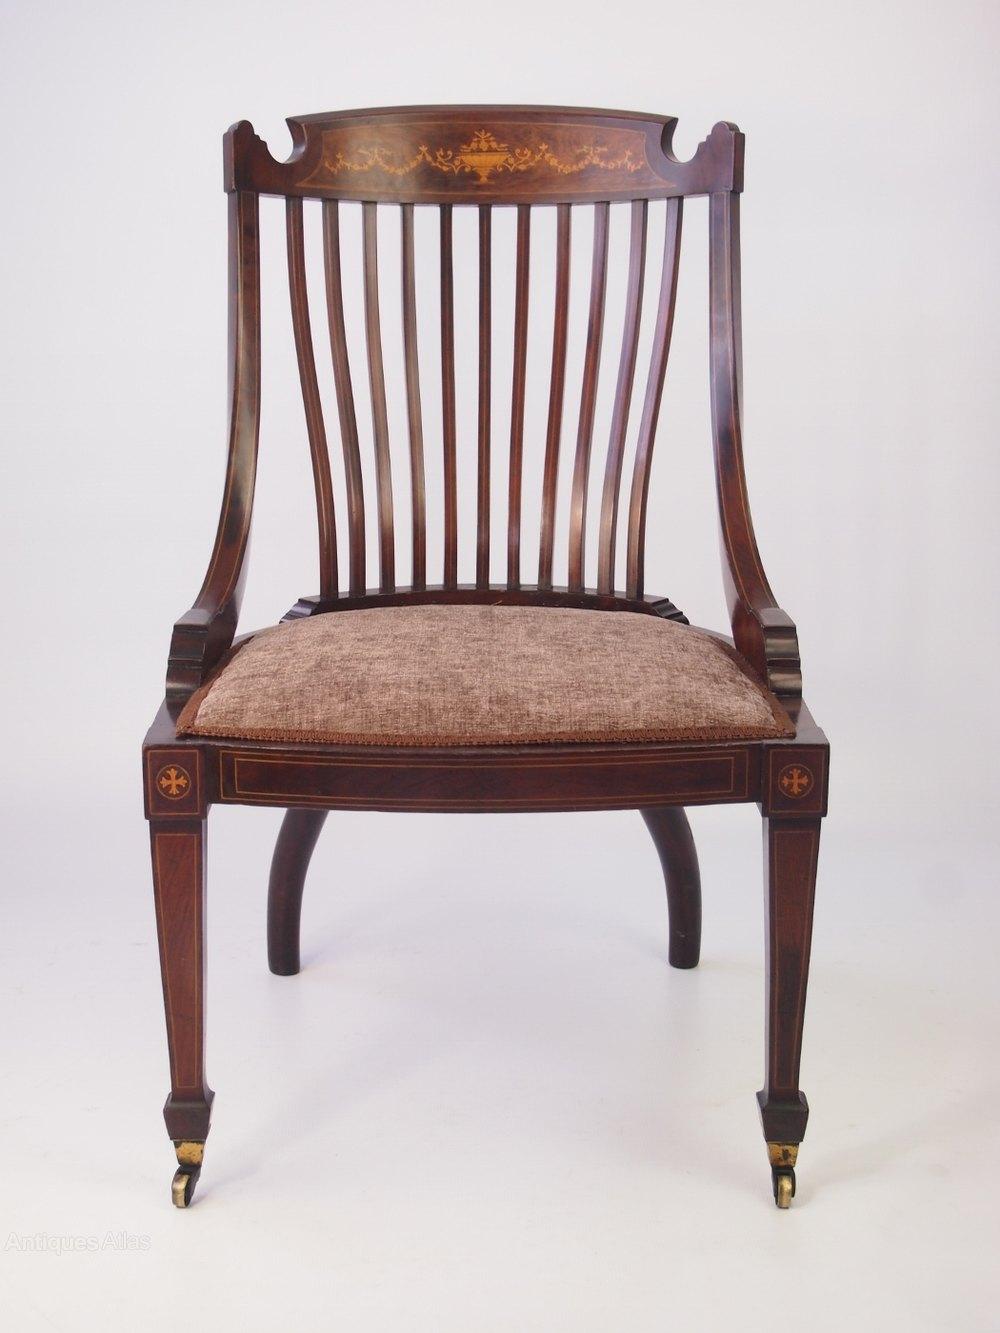 victorian mahogany tub dressing table chair antiques atlas. Black Bedroom Furniture Sets. Home Design Ideas